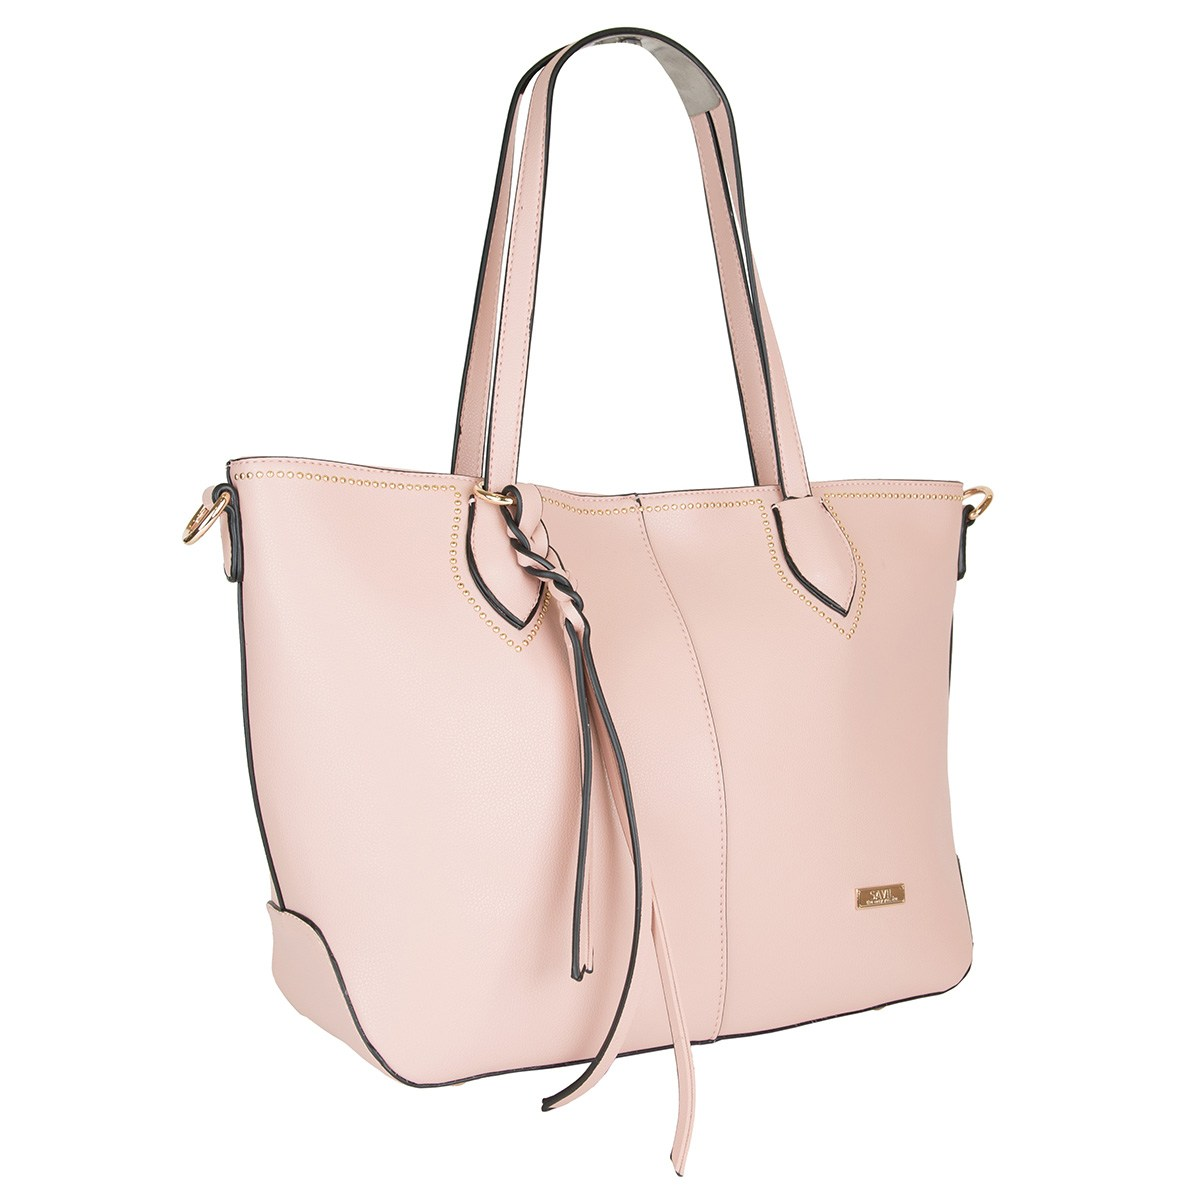 Bagsin-Savil-18-31-22-Pink-Opened-A1